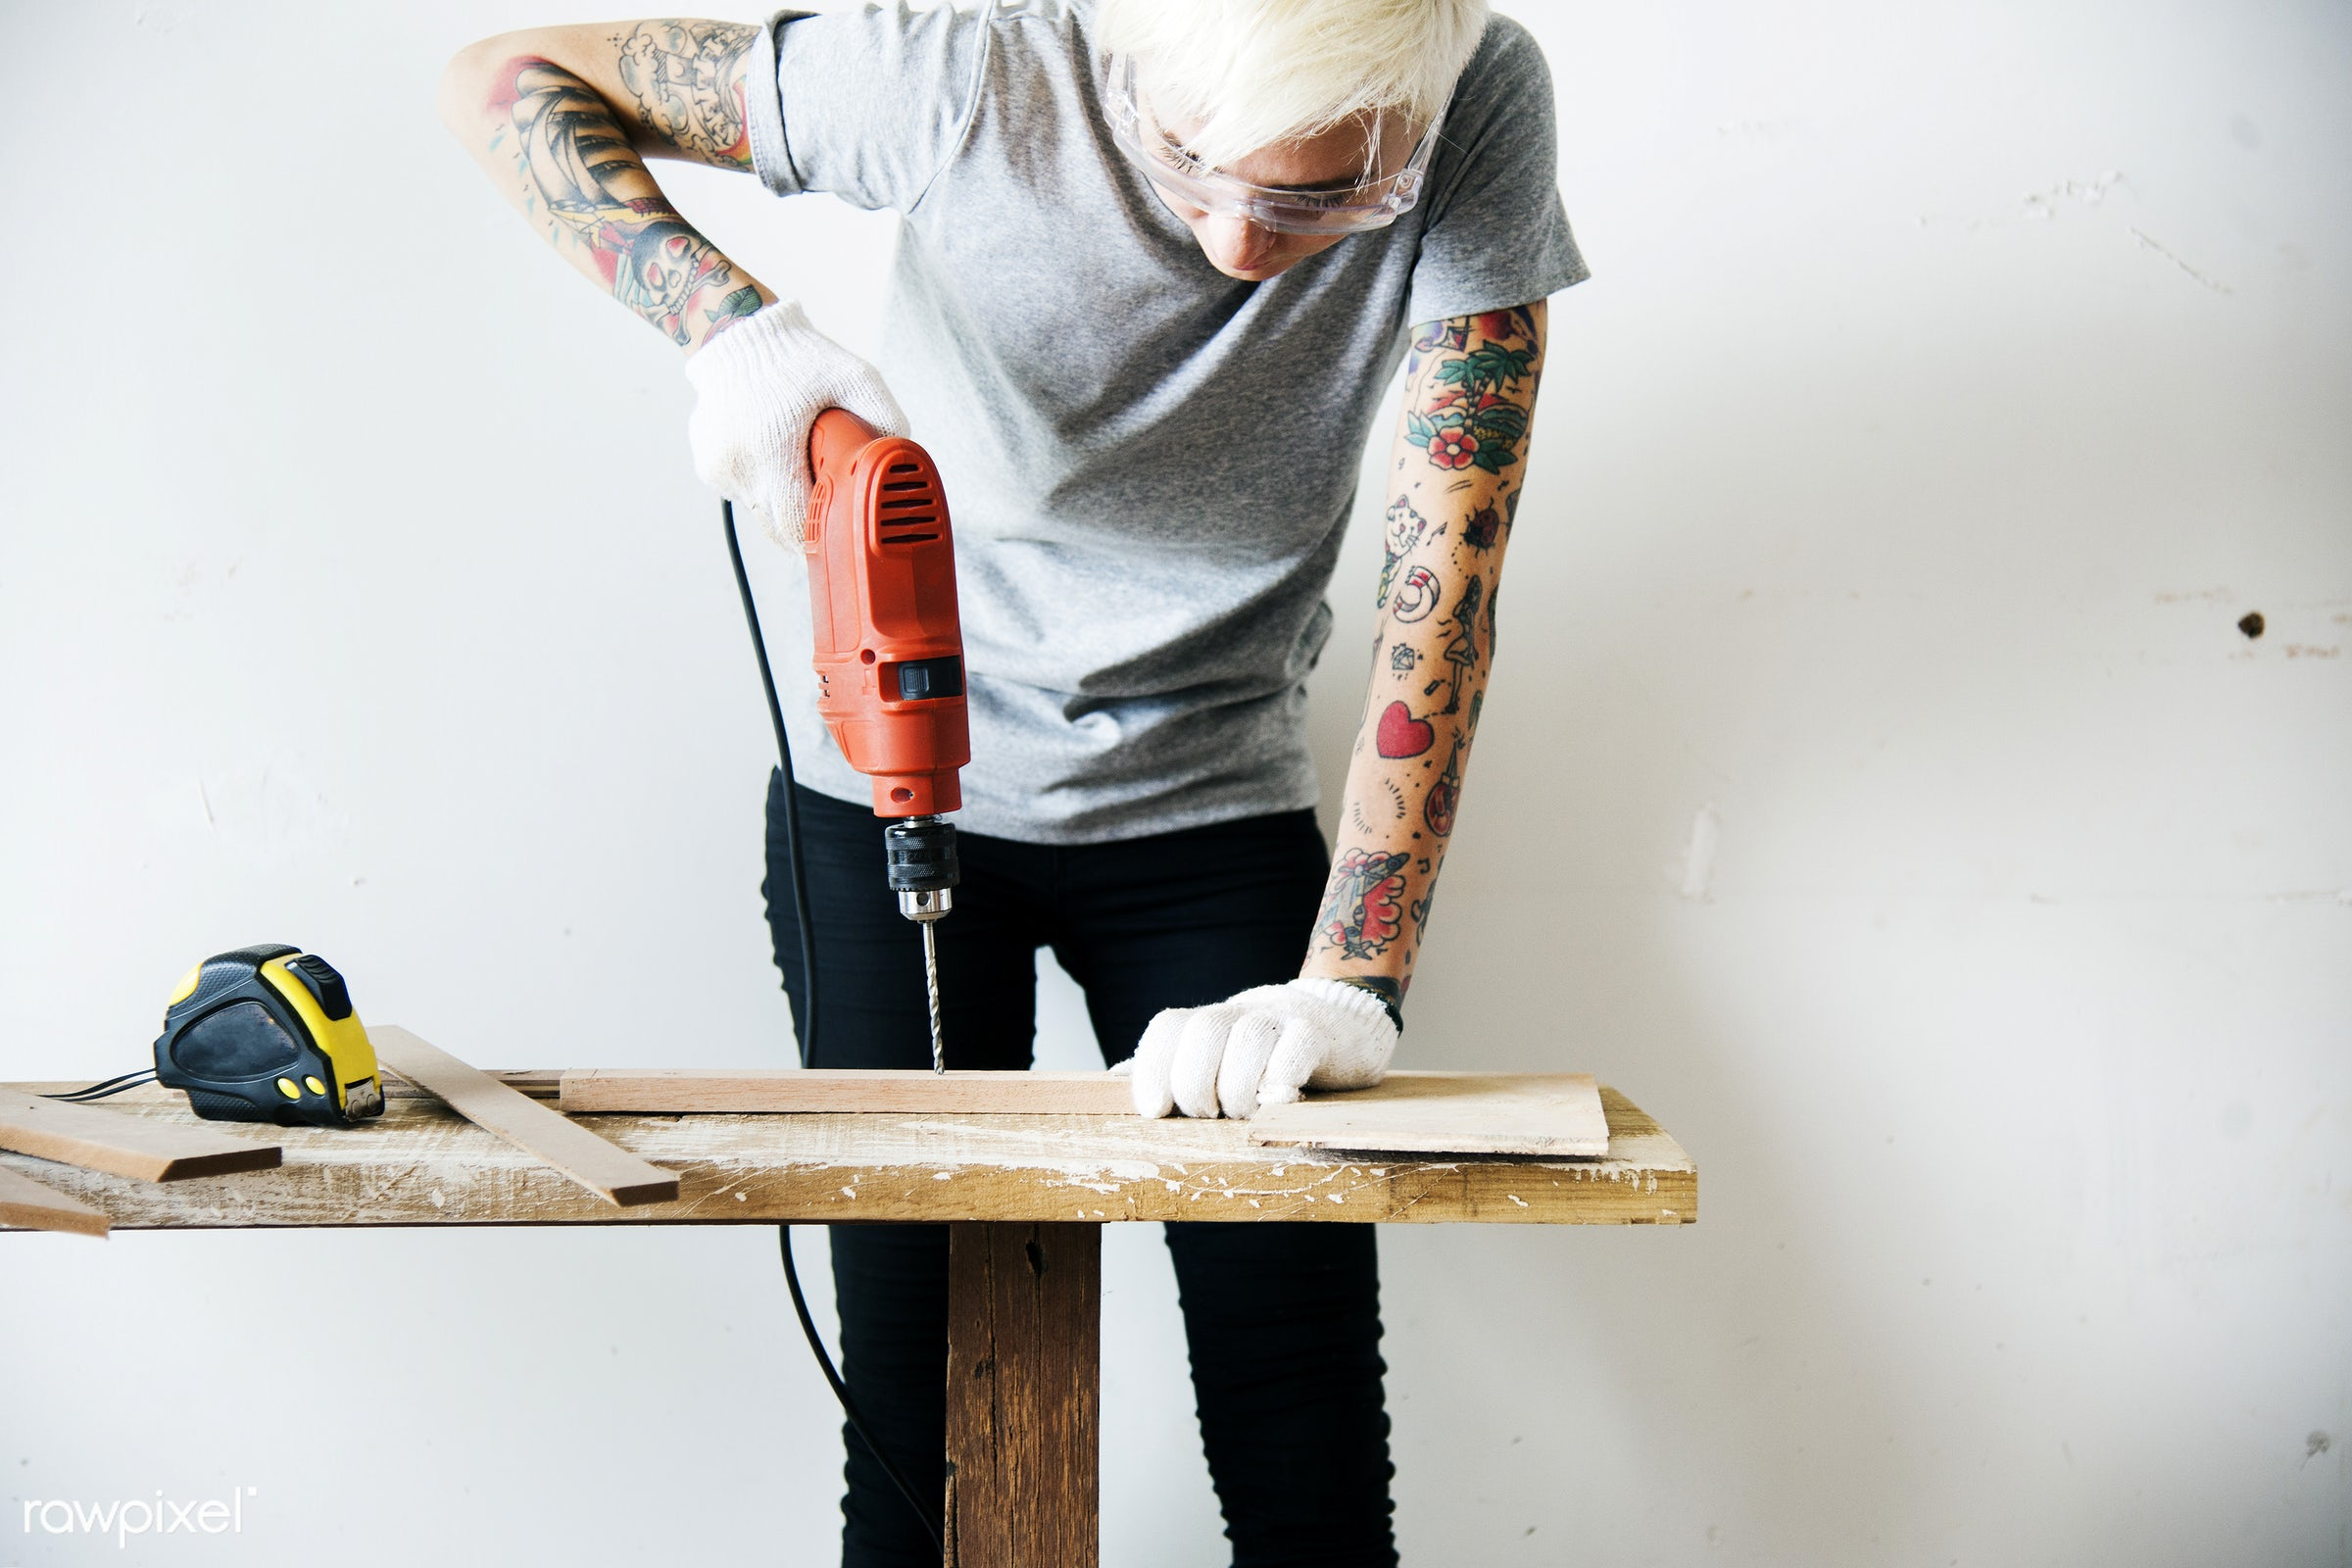 craft, wood, carpentry, tool, plank, equipment, diy, carpenter, woman, craftsman, handyman, worker, drill, repair, industry...